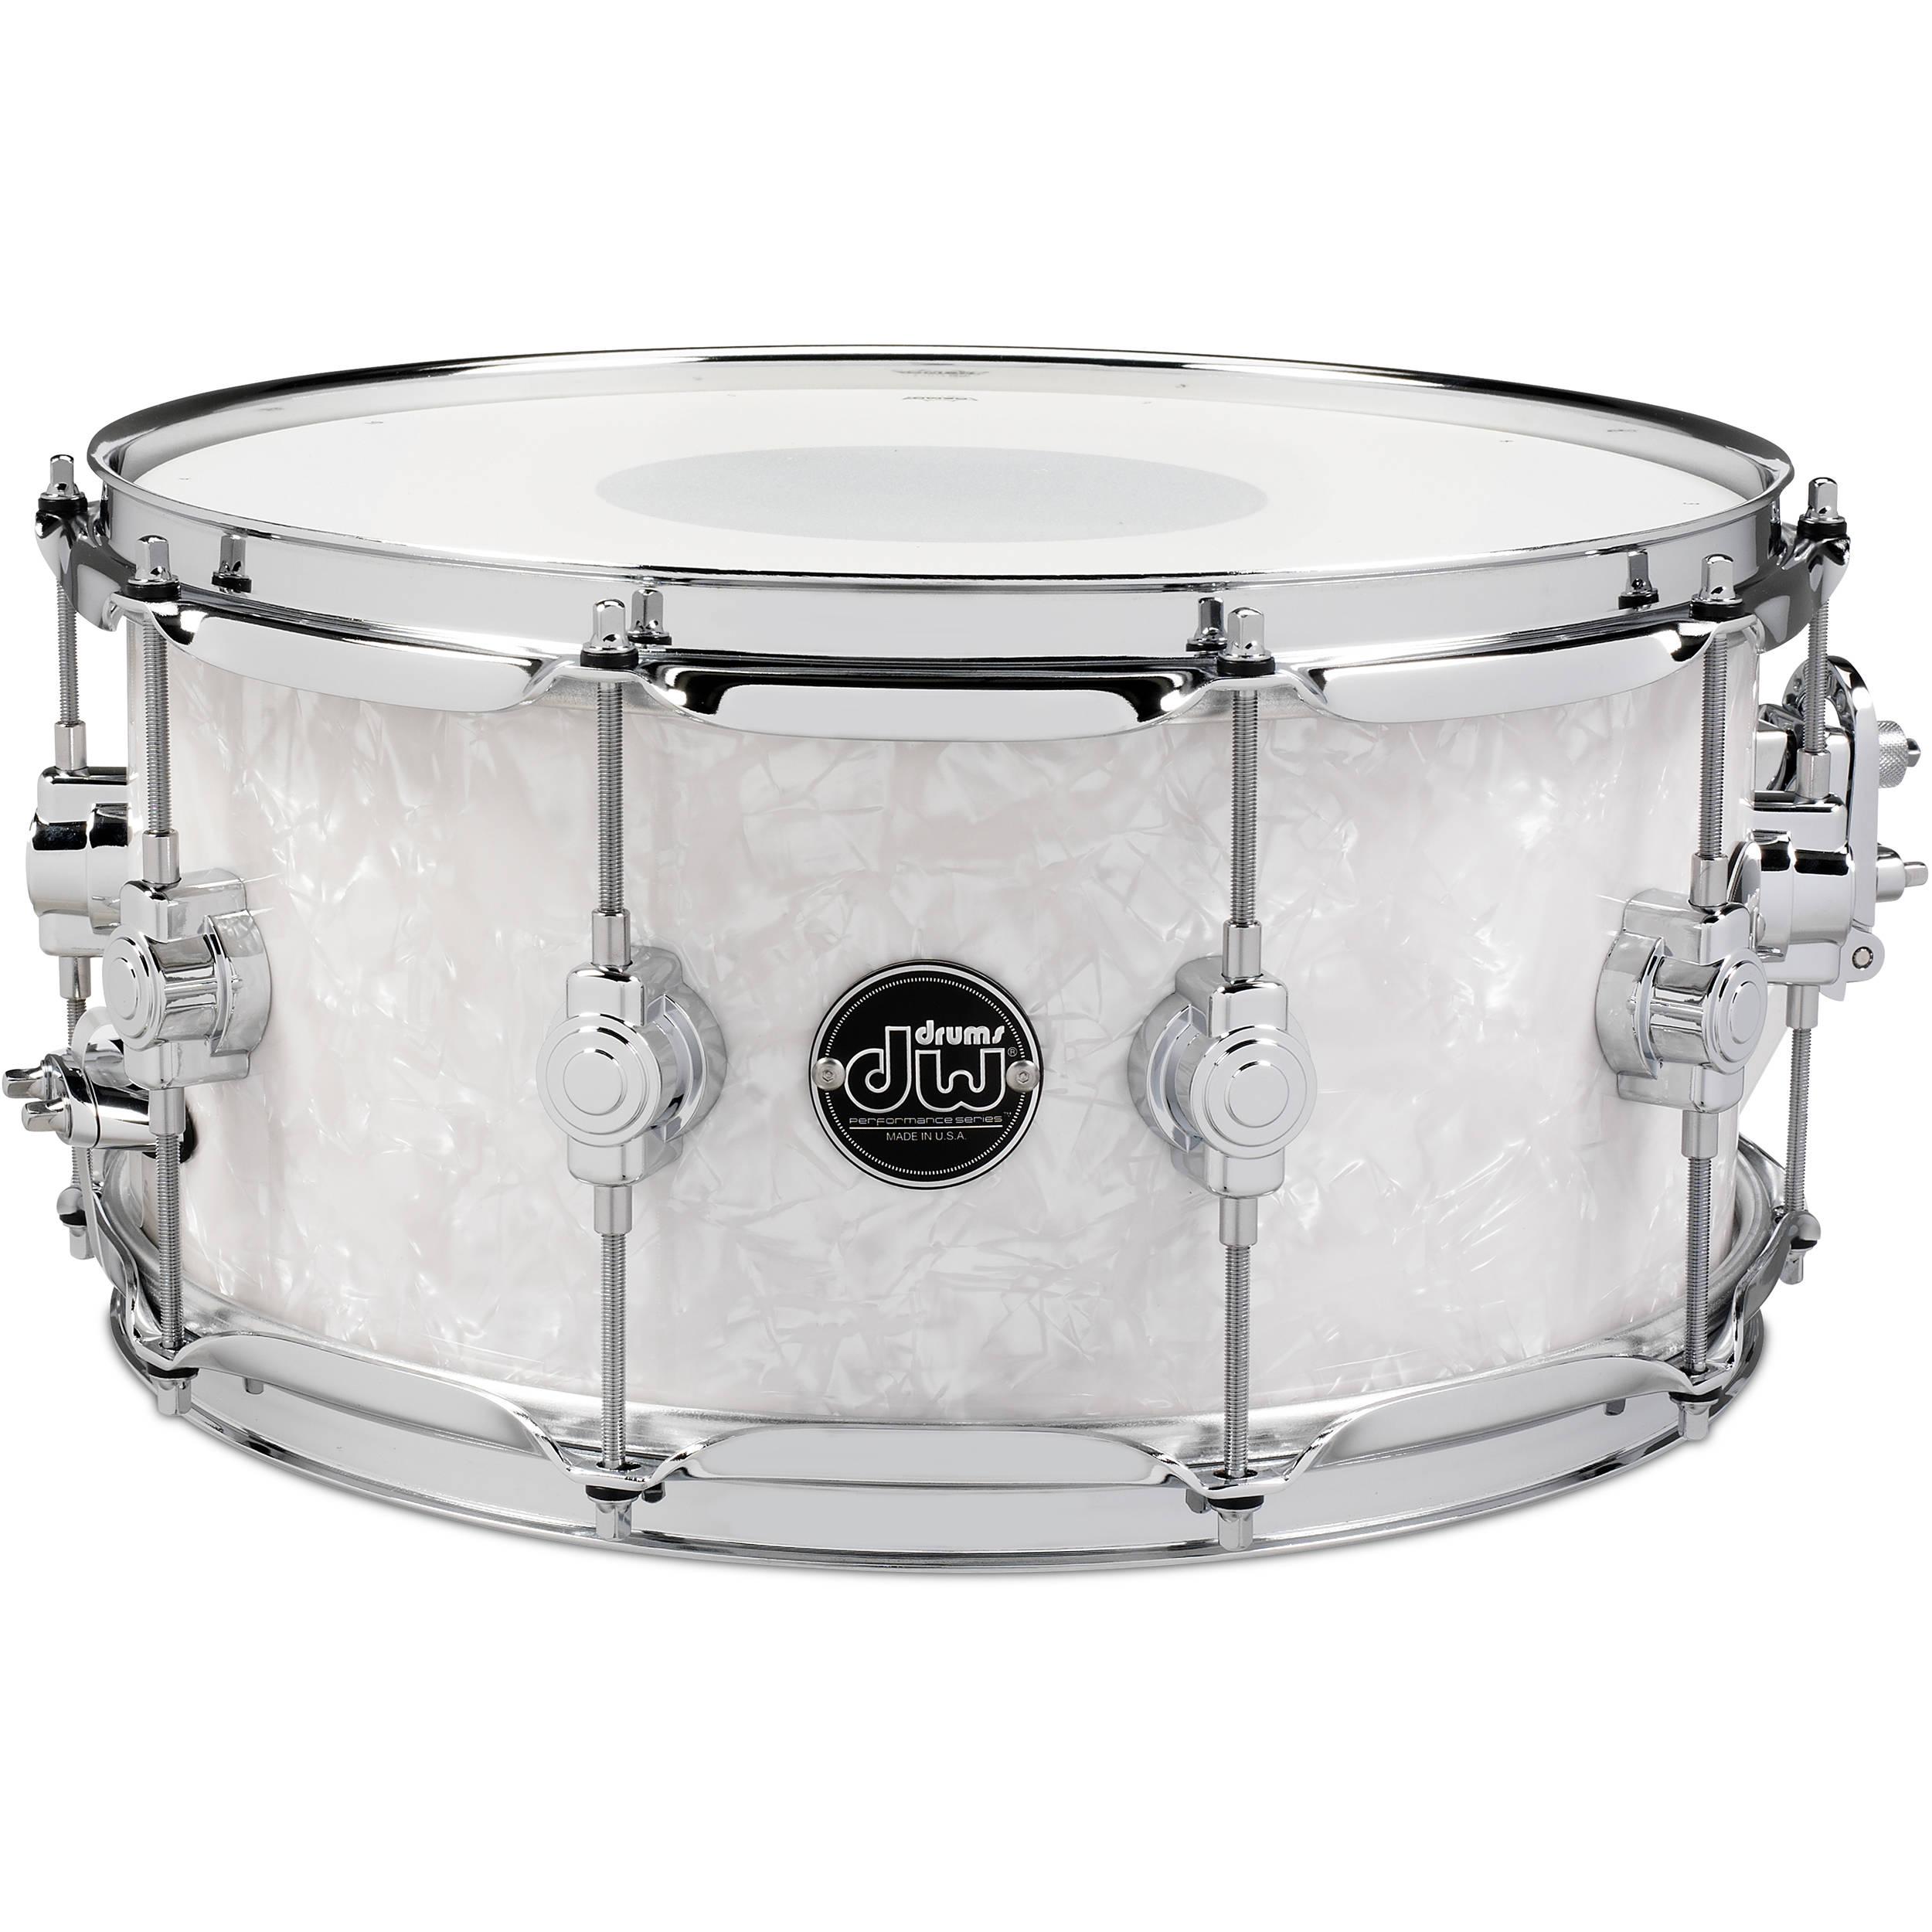 dw drums performance series 6 5 x 14 snare. Black Bedroom Furniture Sets. Home Design Ideas